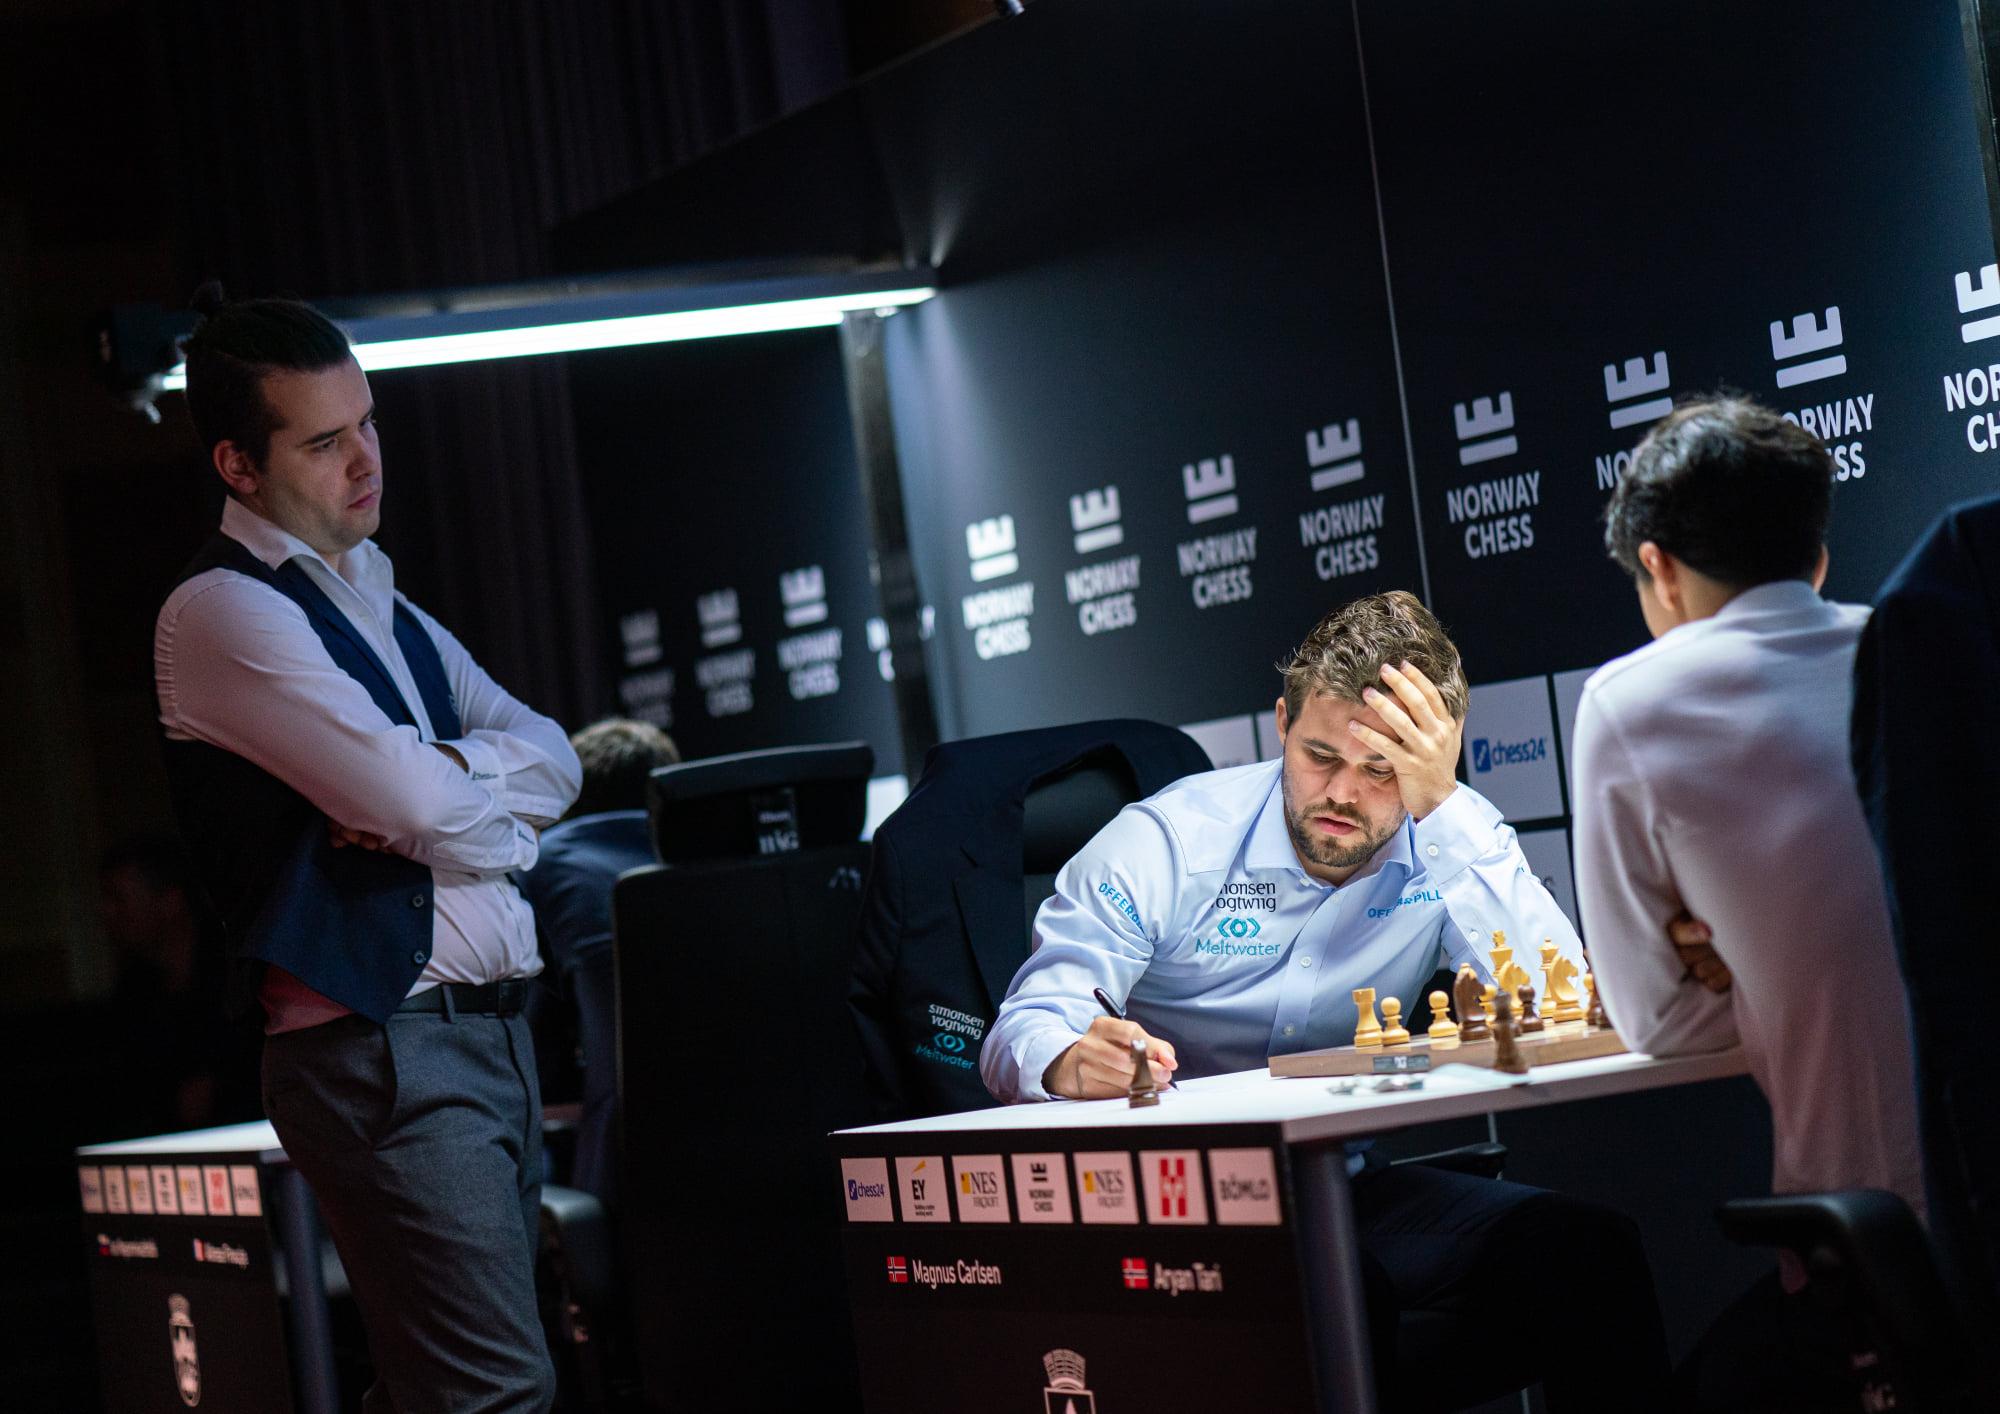 Peluang Catur Norwegia Carlsen Nepomniachtchi